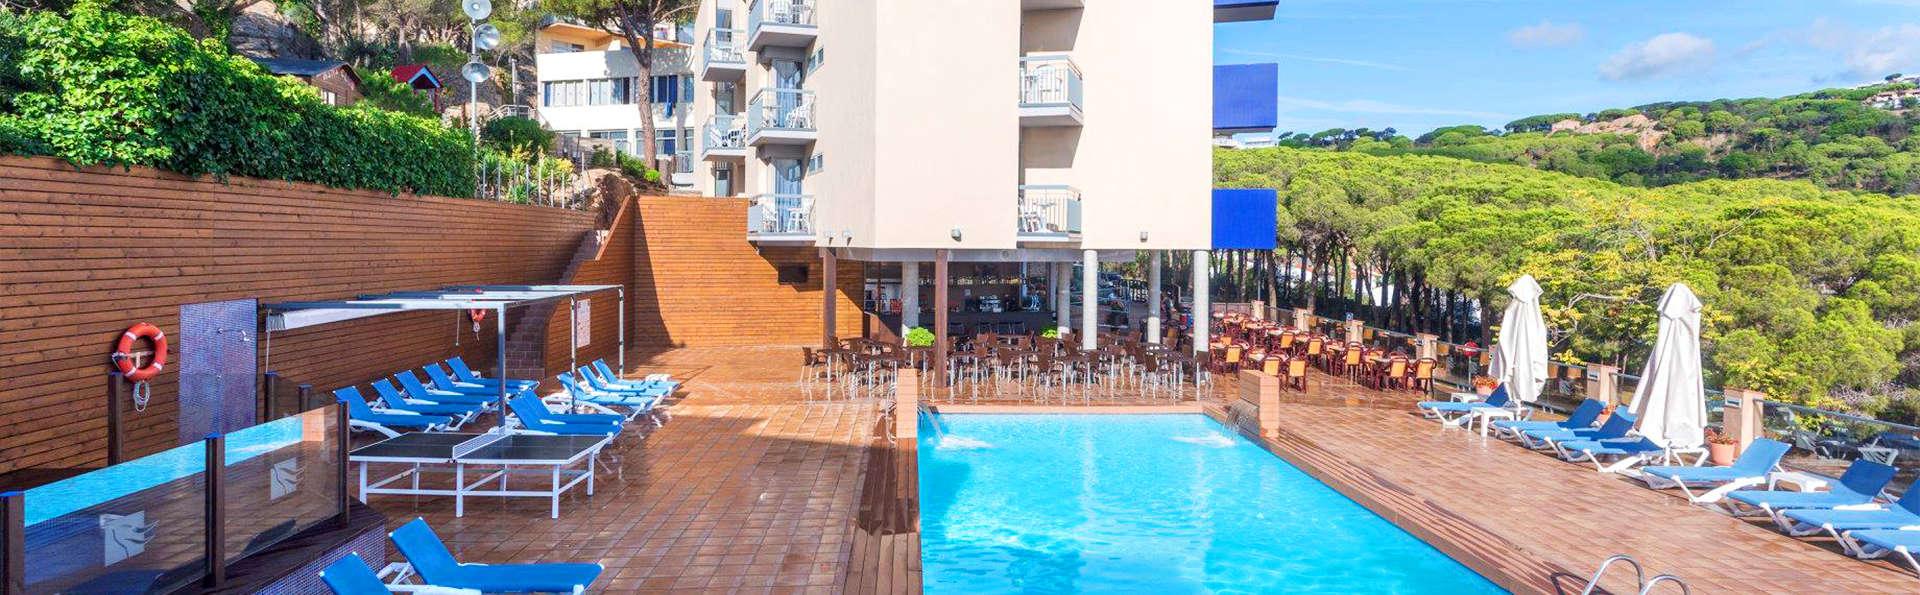 Hotel GHT S'Agaró Mar  - EDIT_3_PISCINA.jpg